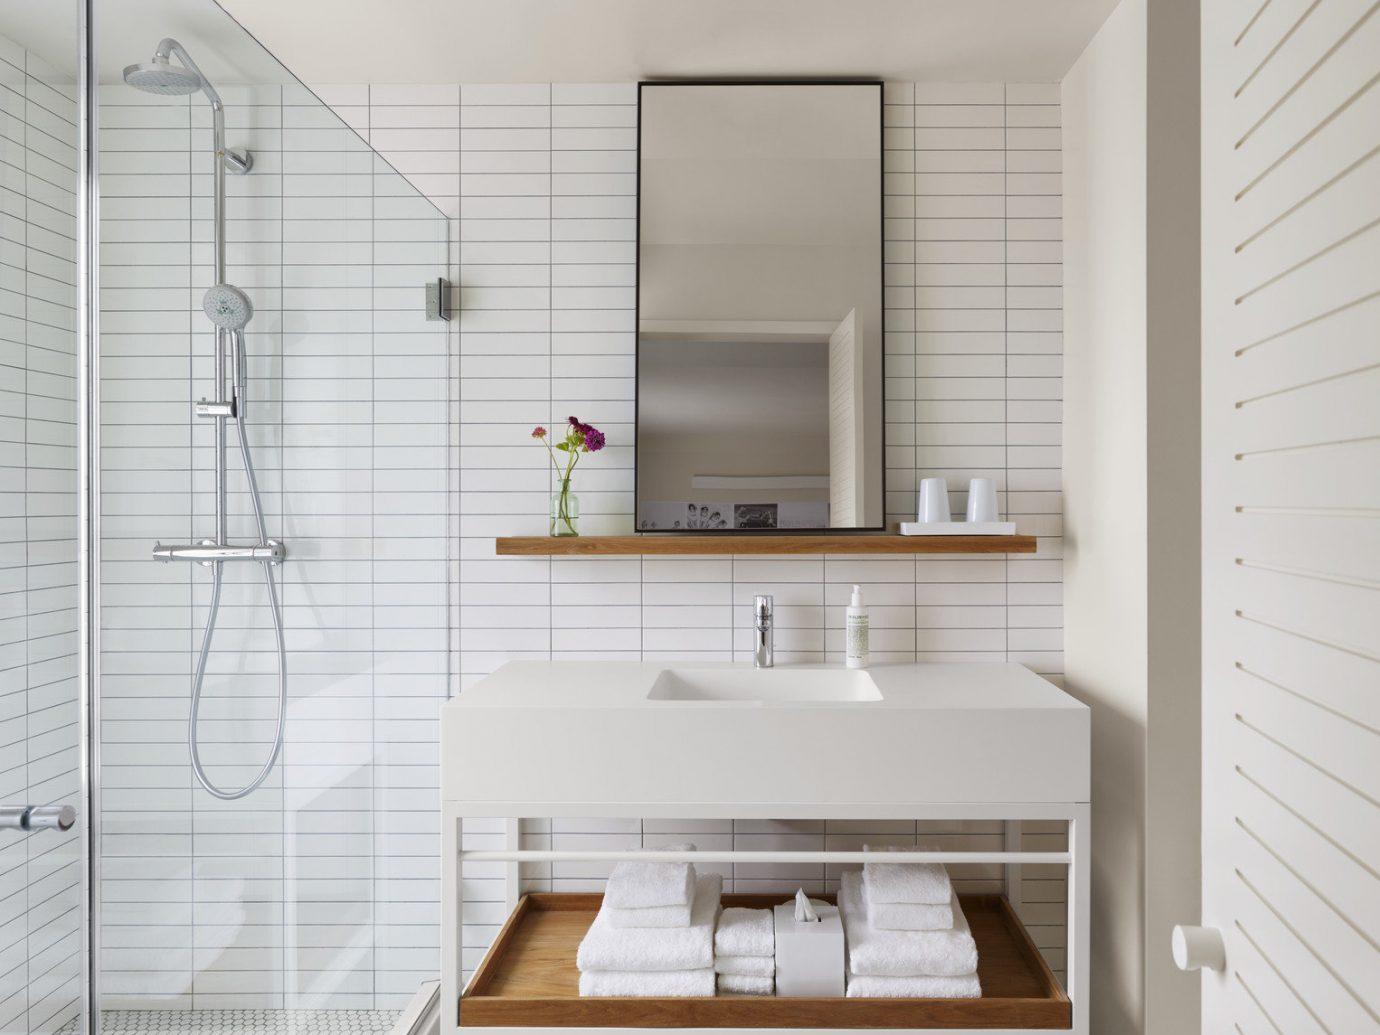 bathroom clean Elegant Hotels interior Luxury Modern neutral tones regal shower sophisticated indoor wall floor room property interior design home flooring real estate Design apartment